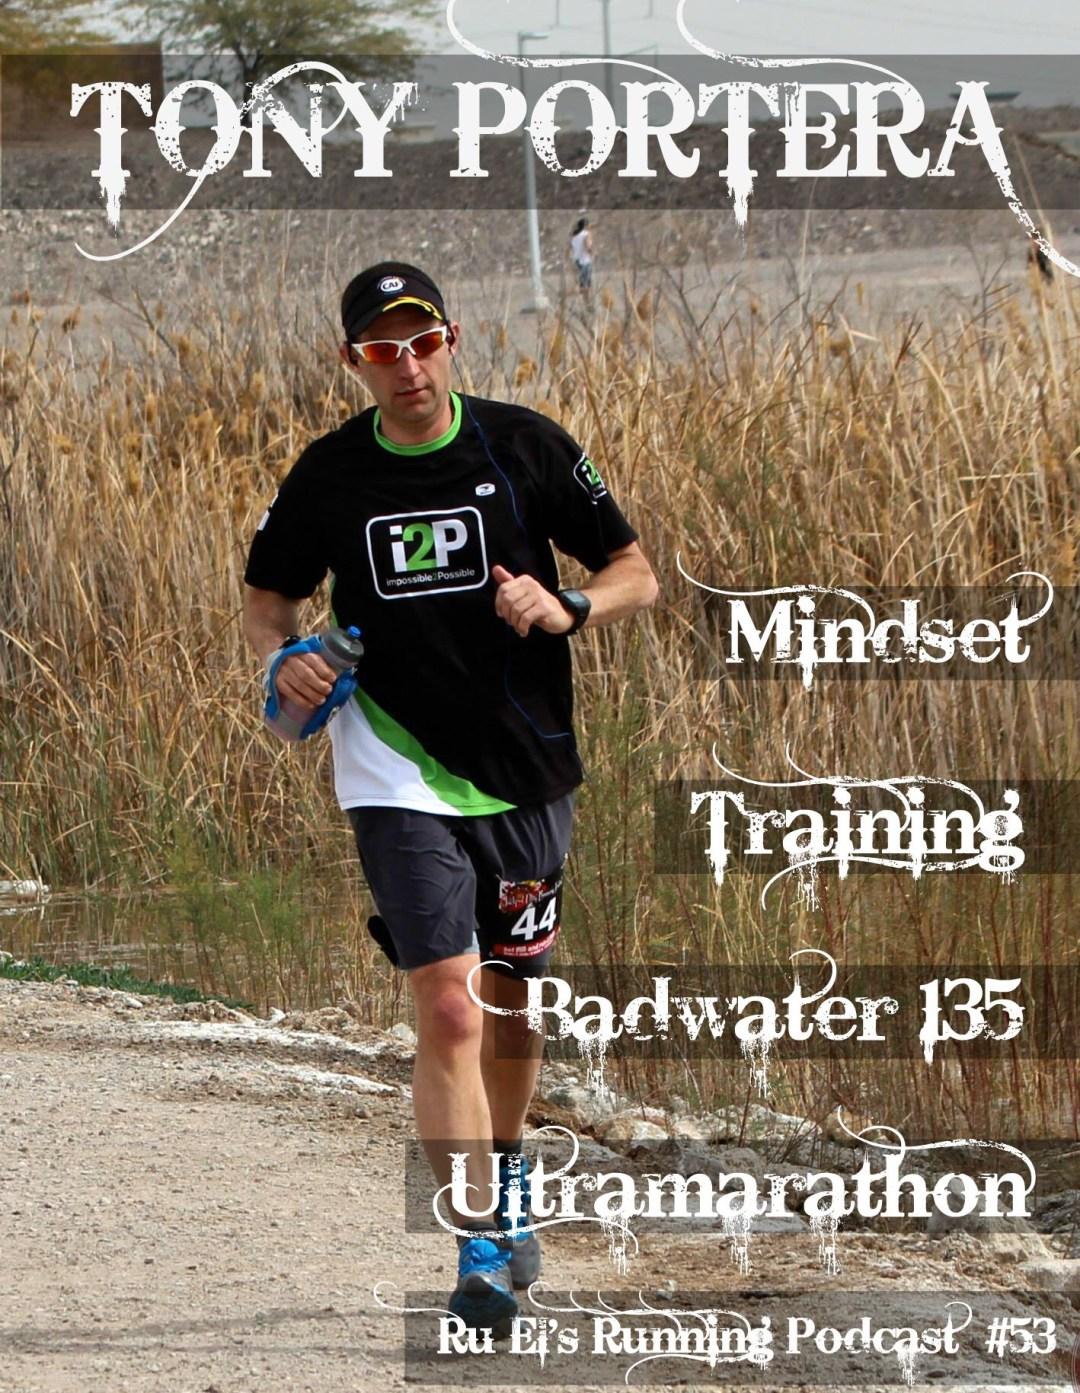 Ru El's Running 053 : Special Guest – Tony Portera – Part 1 | Badwater 135 | Ultramarathon